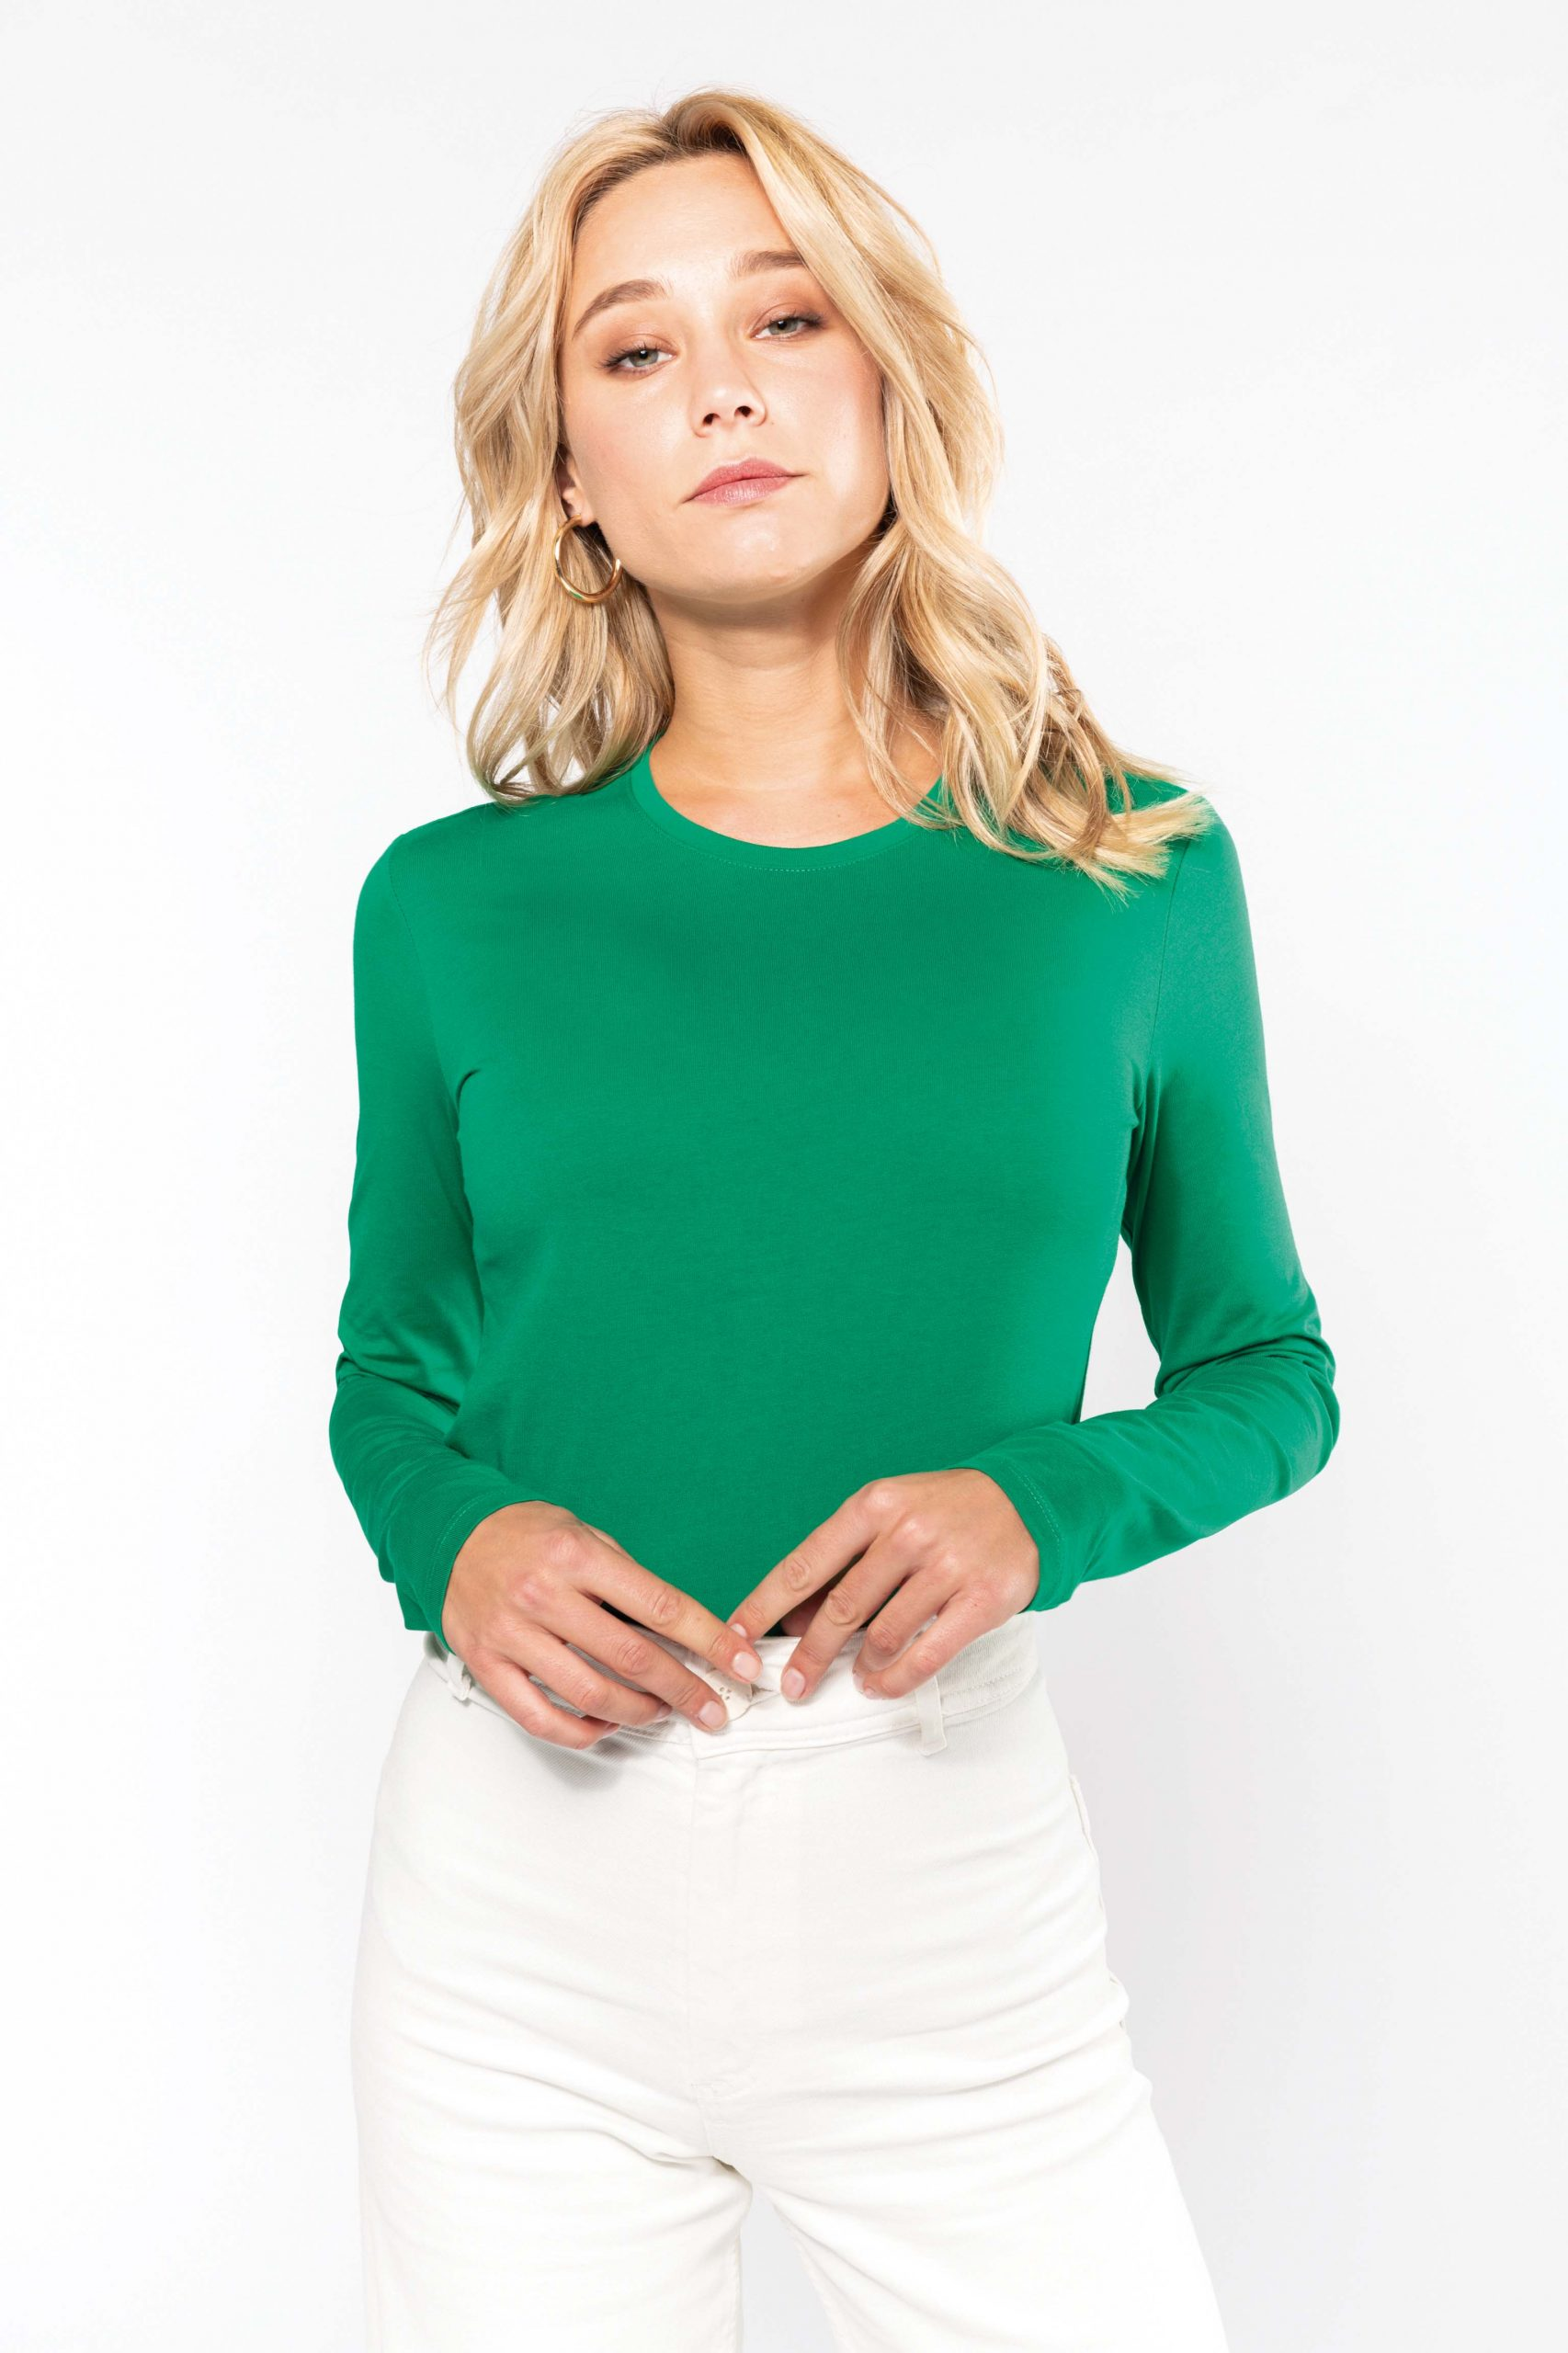 T-shirt Gekamd Enzymbehandeld Katoen Lange Mouw Women